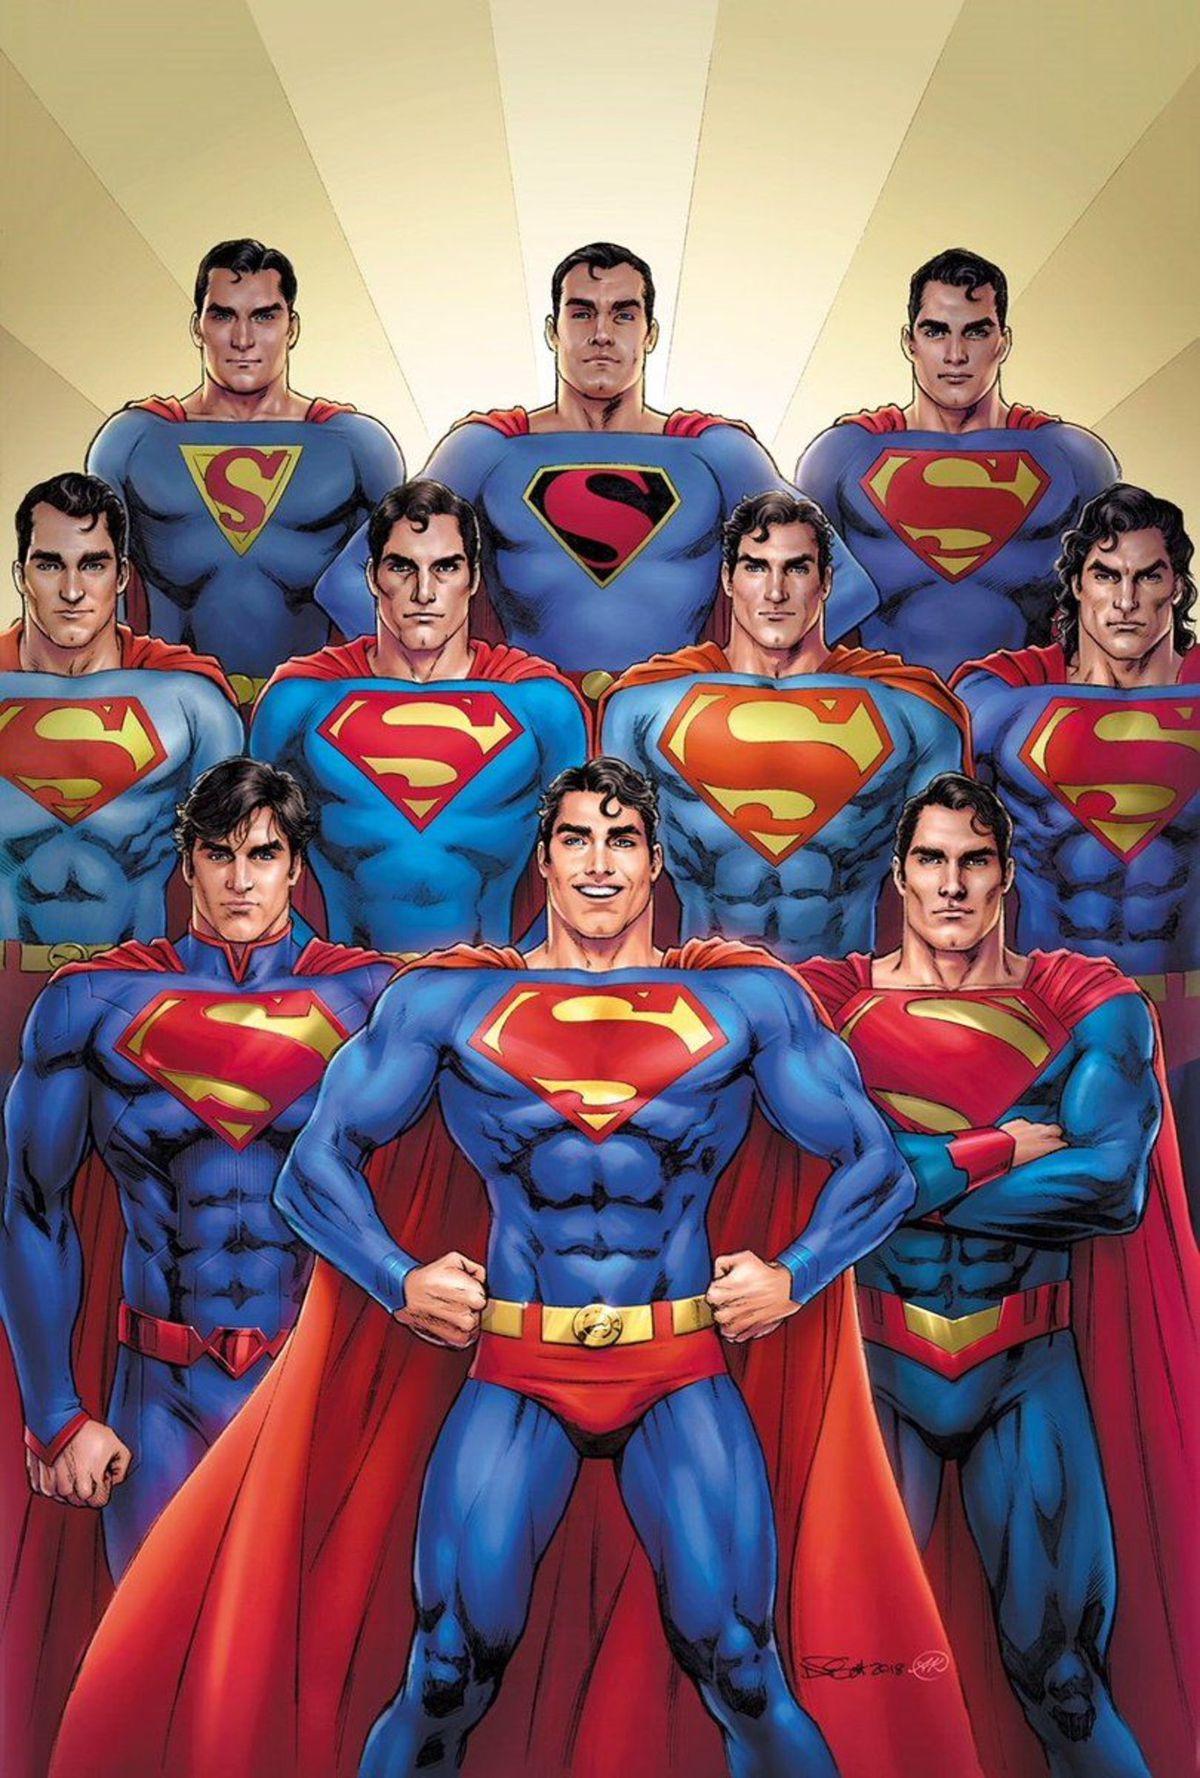 Art of ten Superman from ten different eras and costumes.